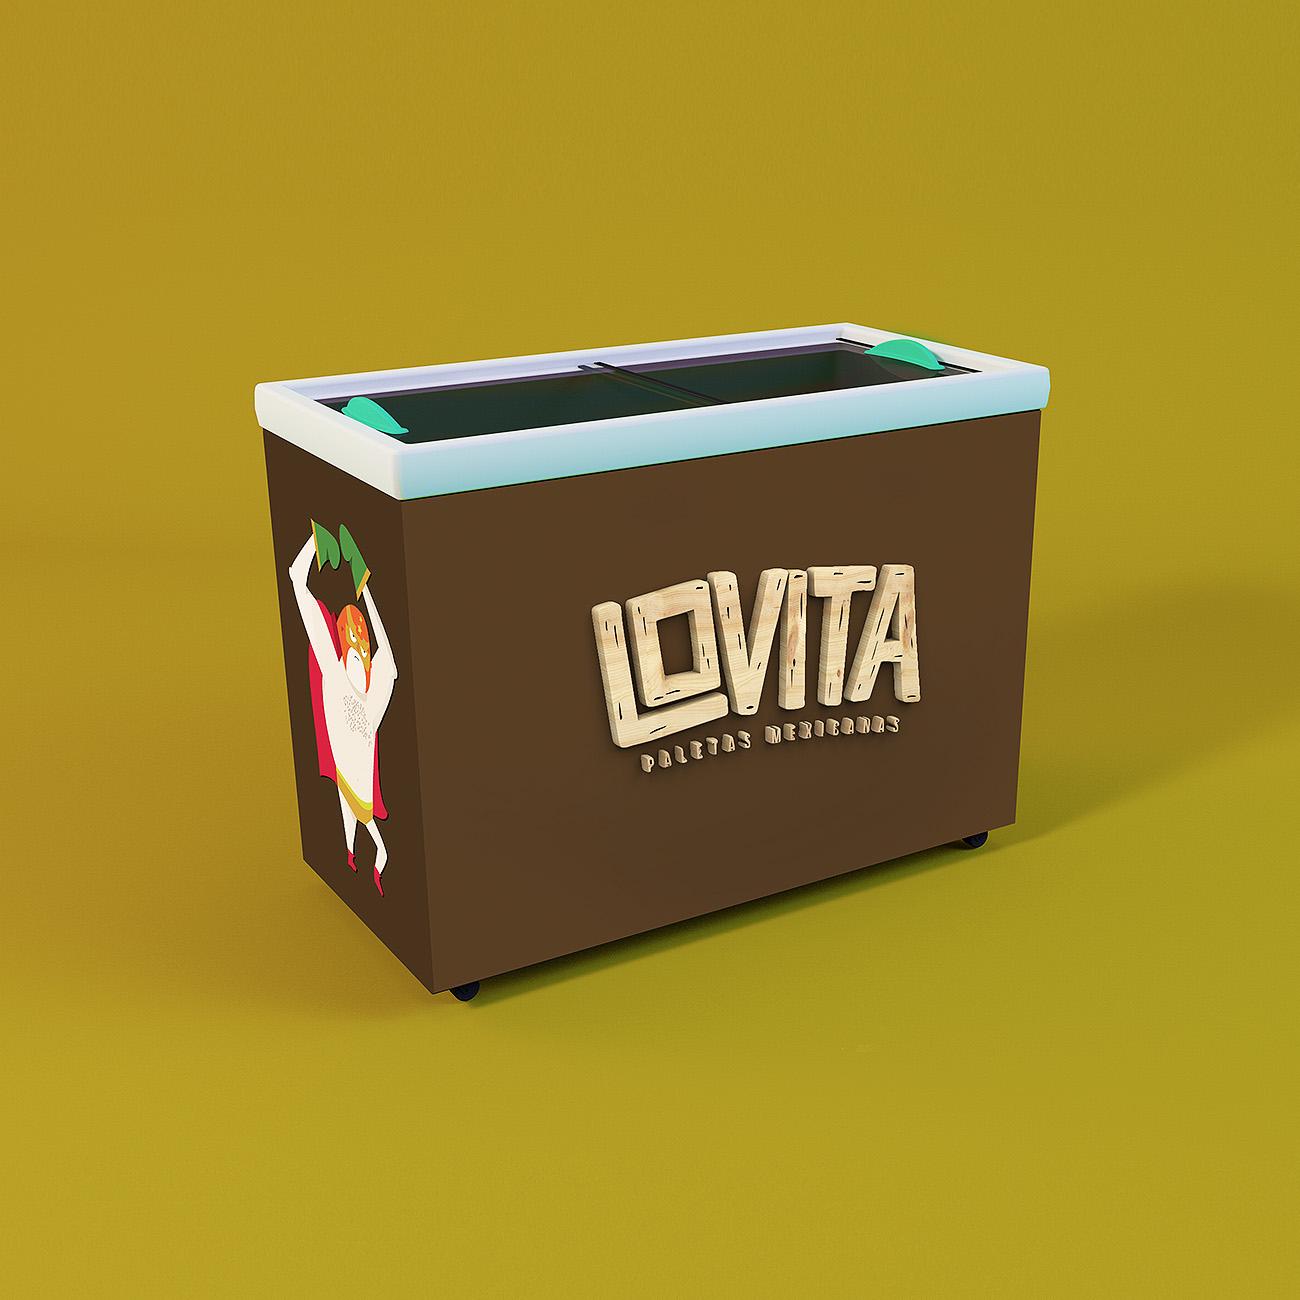 lovita2_0005_Layer-Comp-6